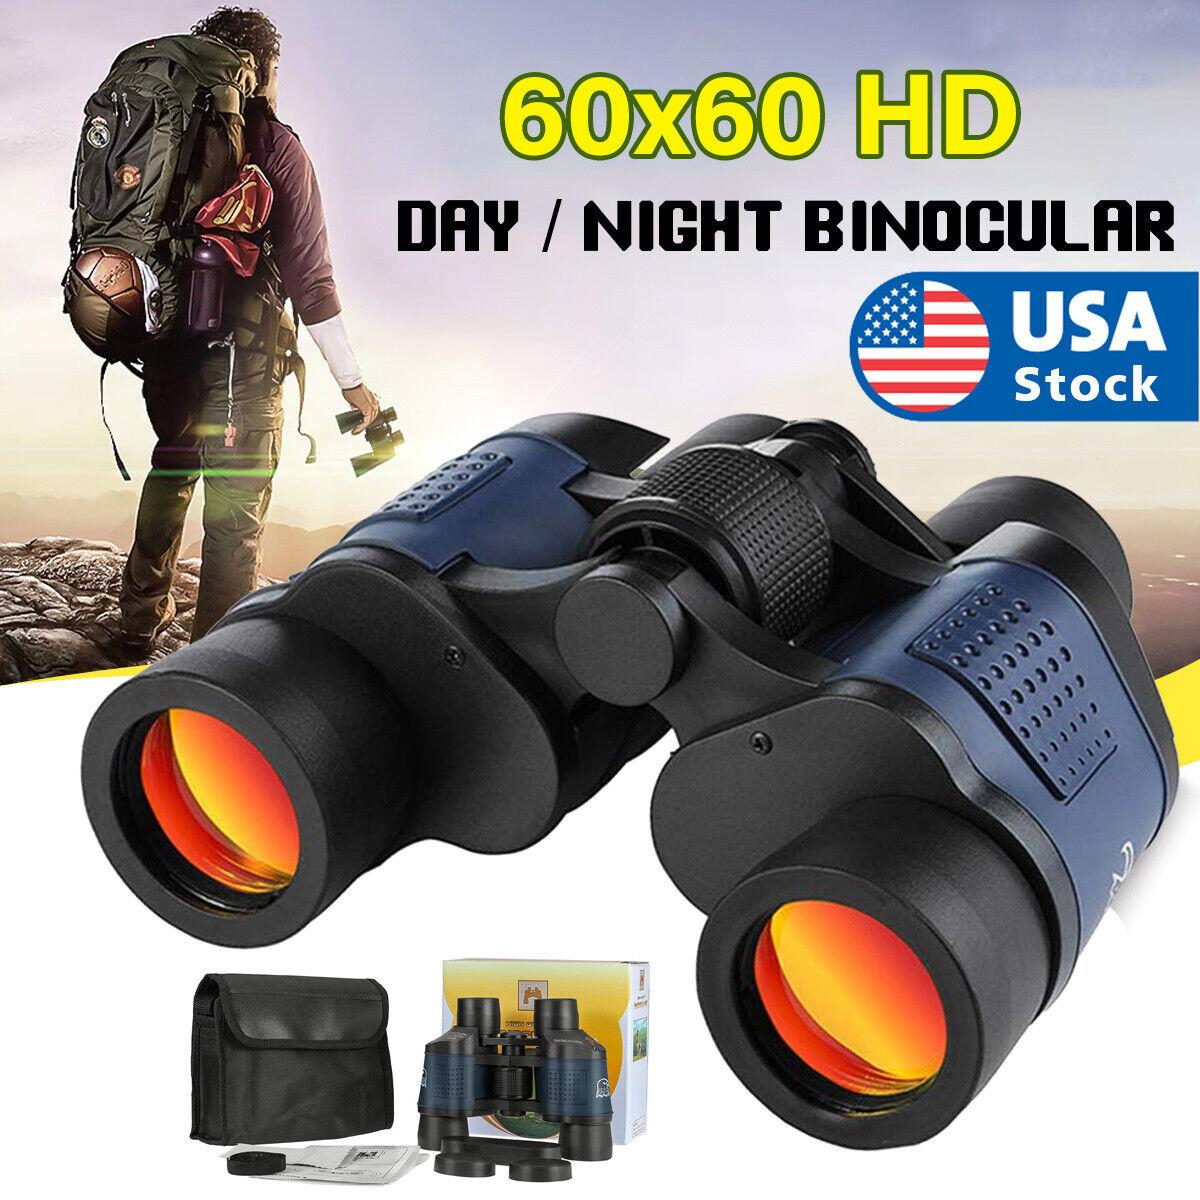 60X60 Zoom Binoculars Day/Night Vision Travel Outdoor HD Hunting Telescope  Bag Binoculars & Monoculars